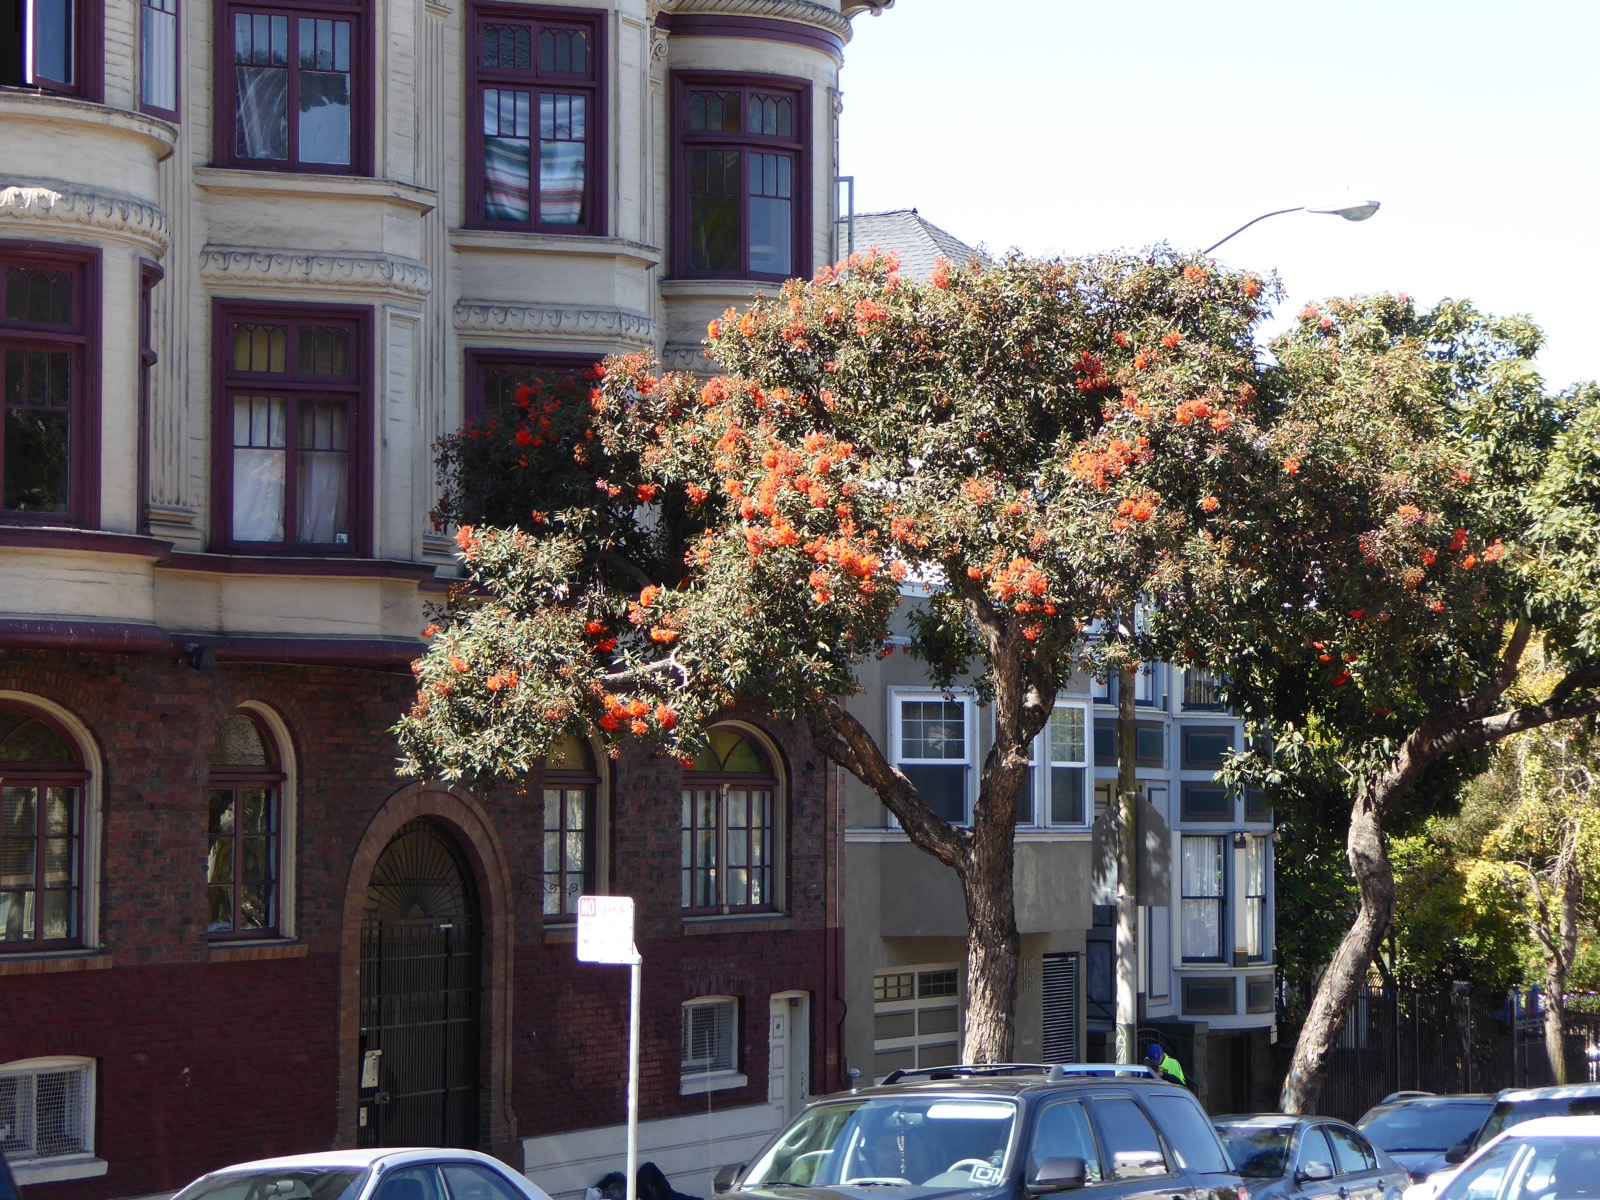 Puhutakawa tree in San Francisco